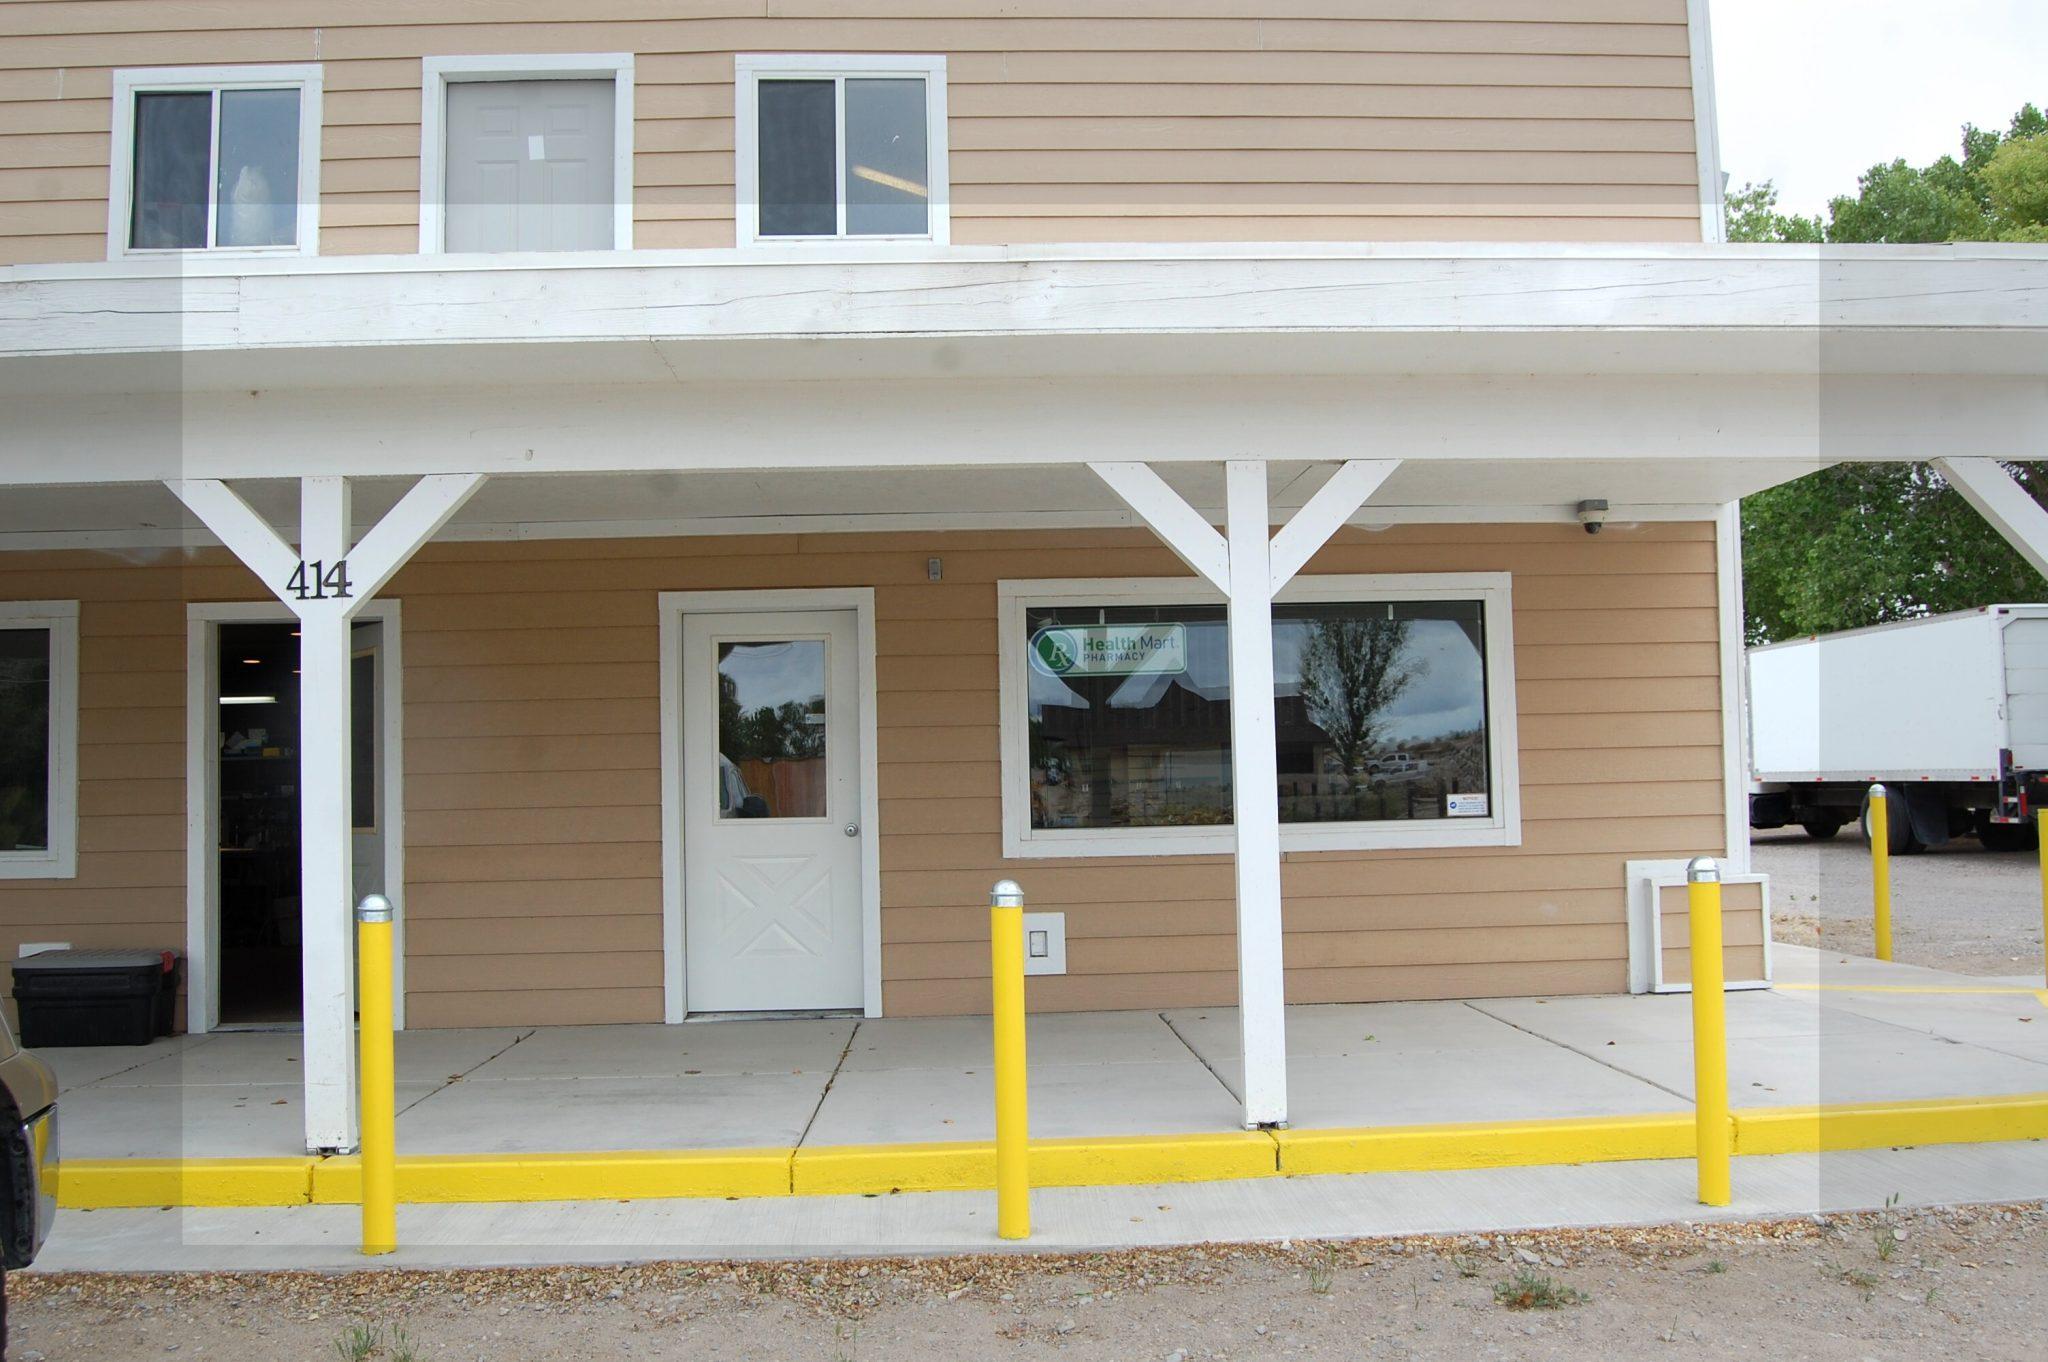 New Alamo pharmacy scheduled to open June 2